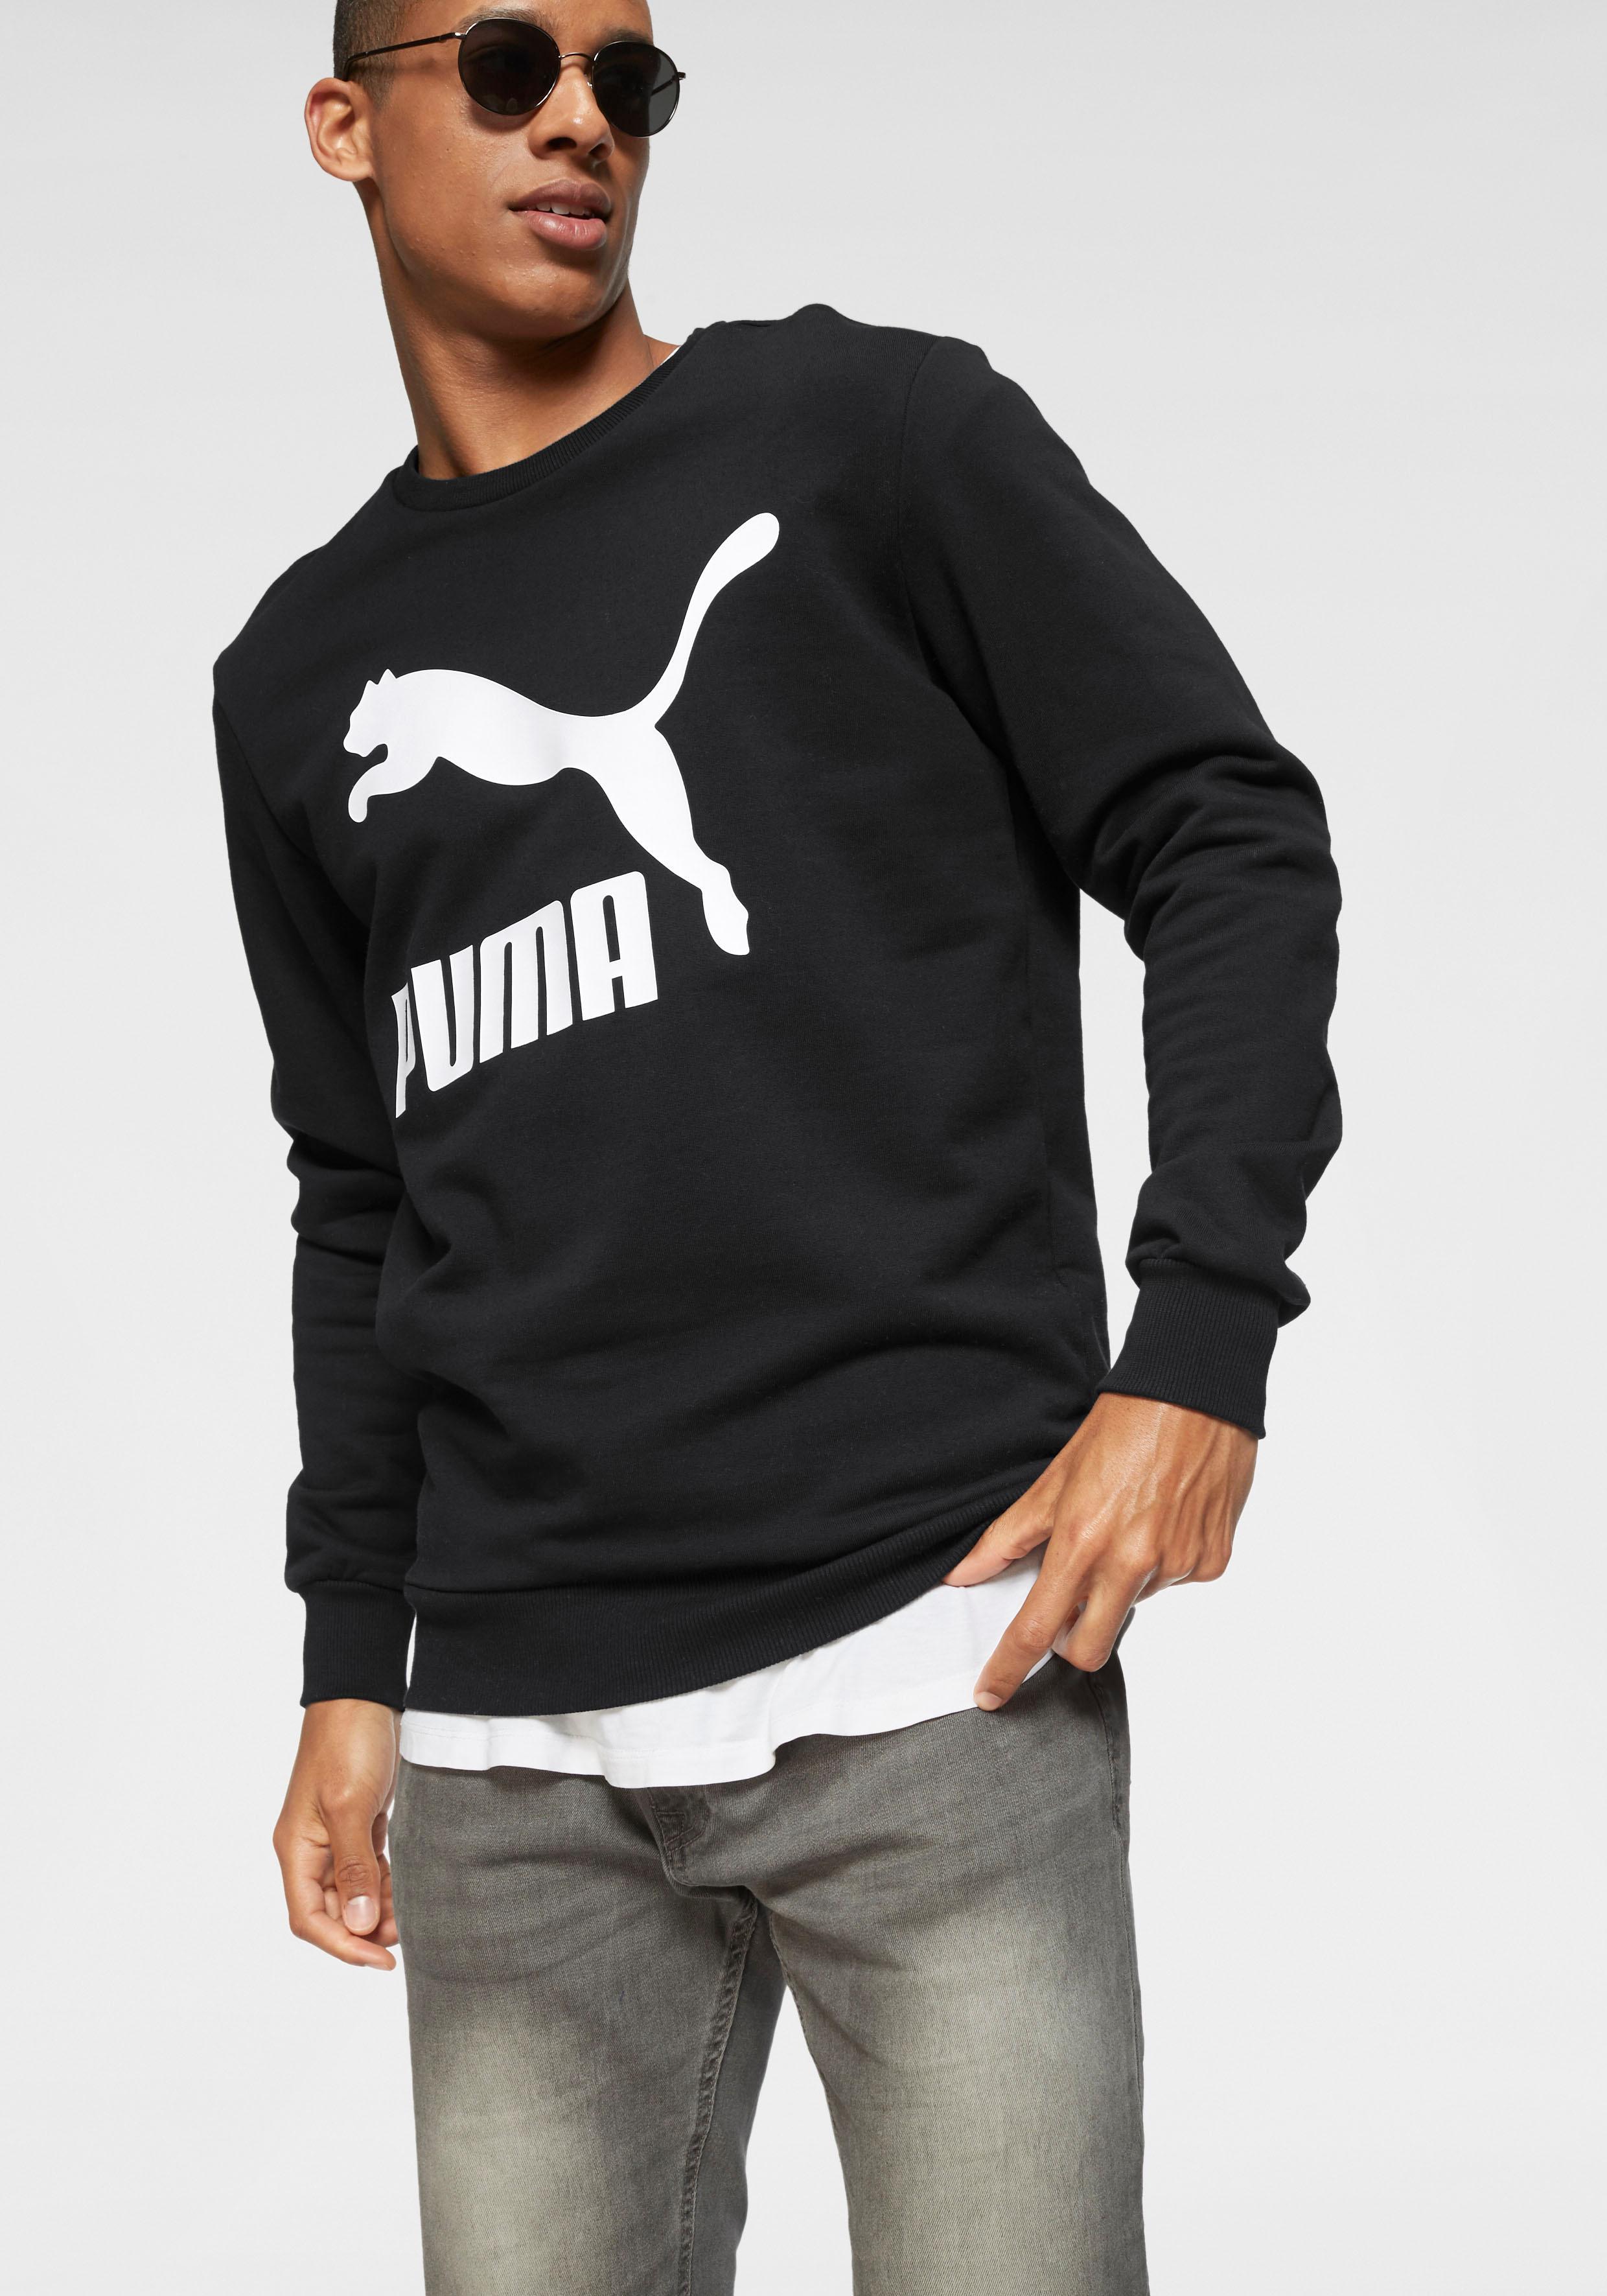 PUMA Sweatshirt CLASSICS LOGO CREW | Bekleidung > Sweatshirts & -jacken > Sweatshirts | Puma